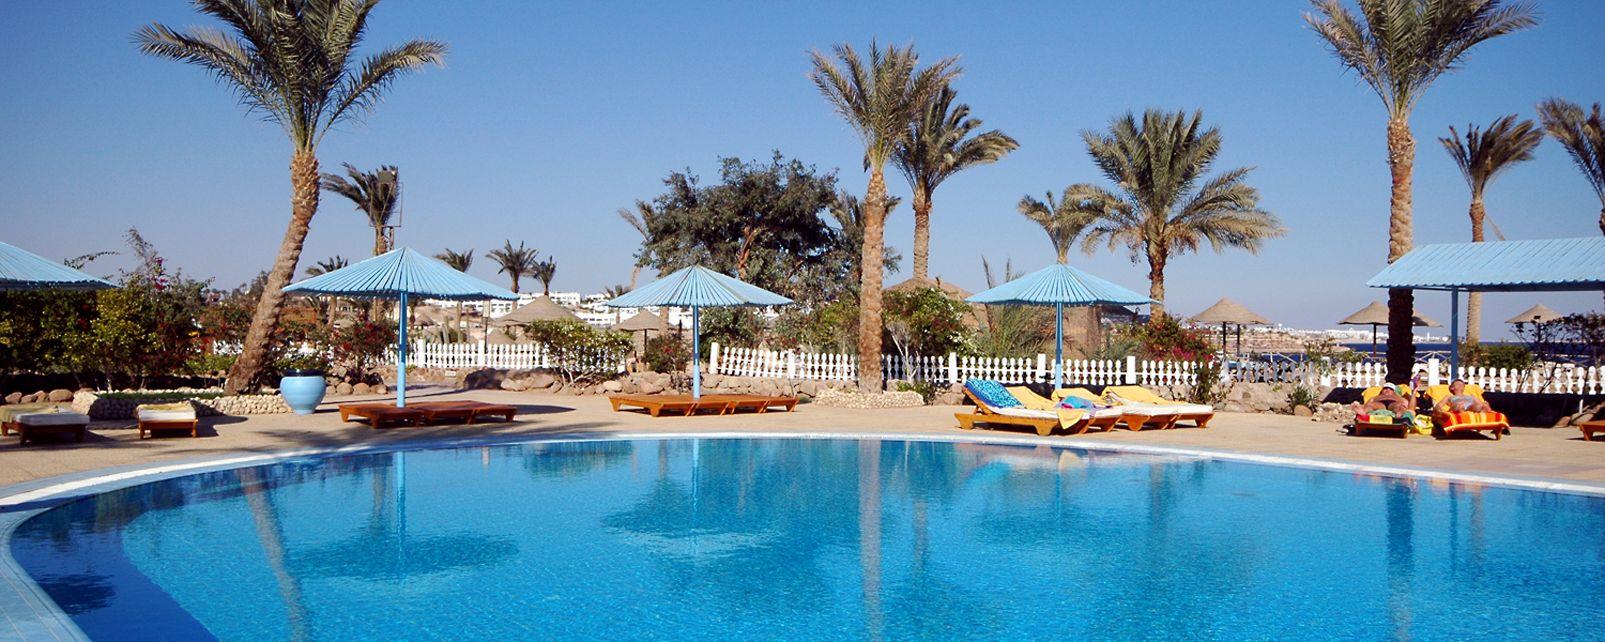 Hotel Pyramisa